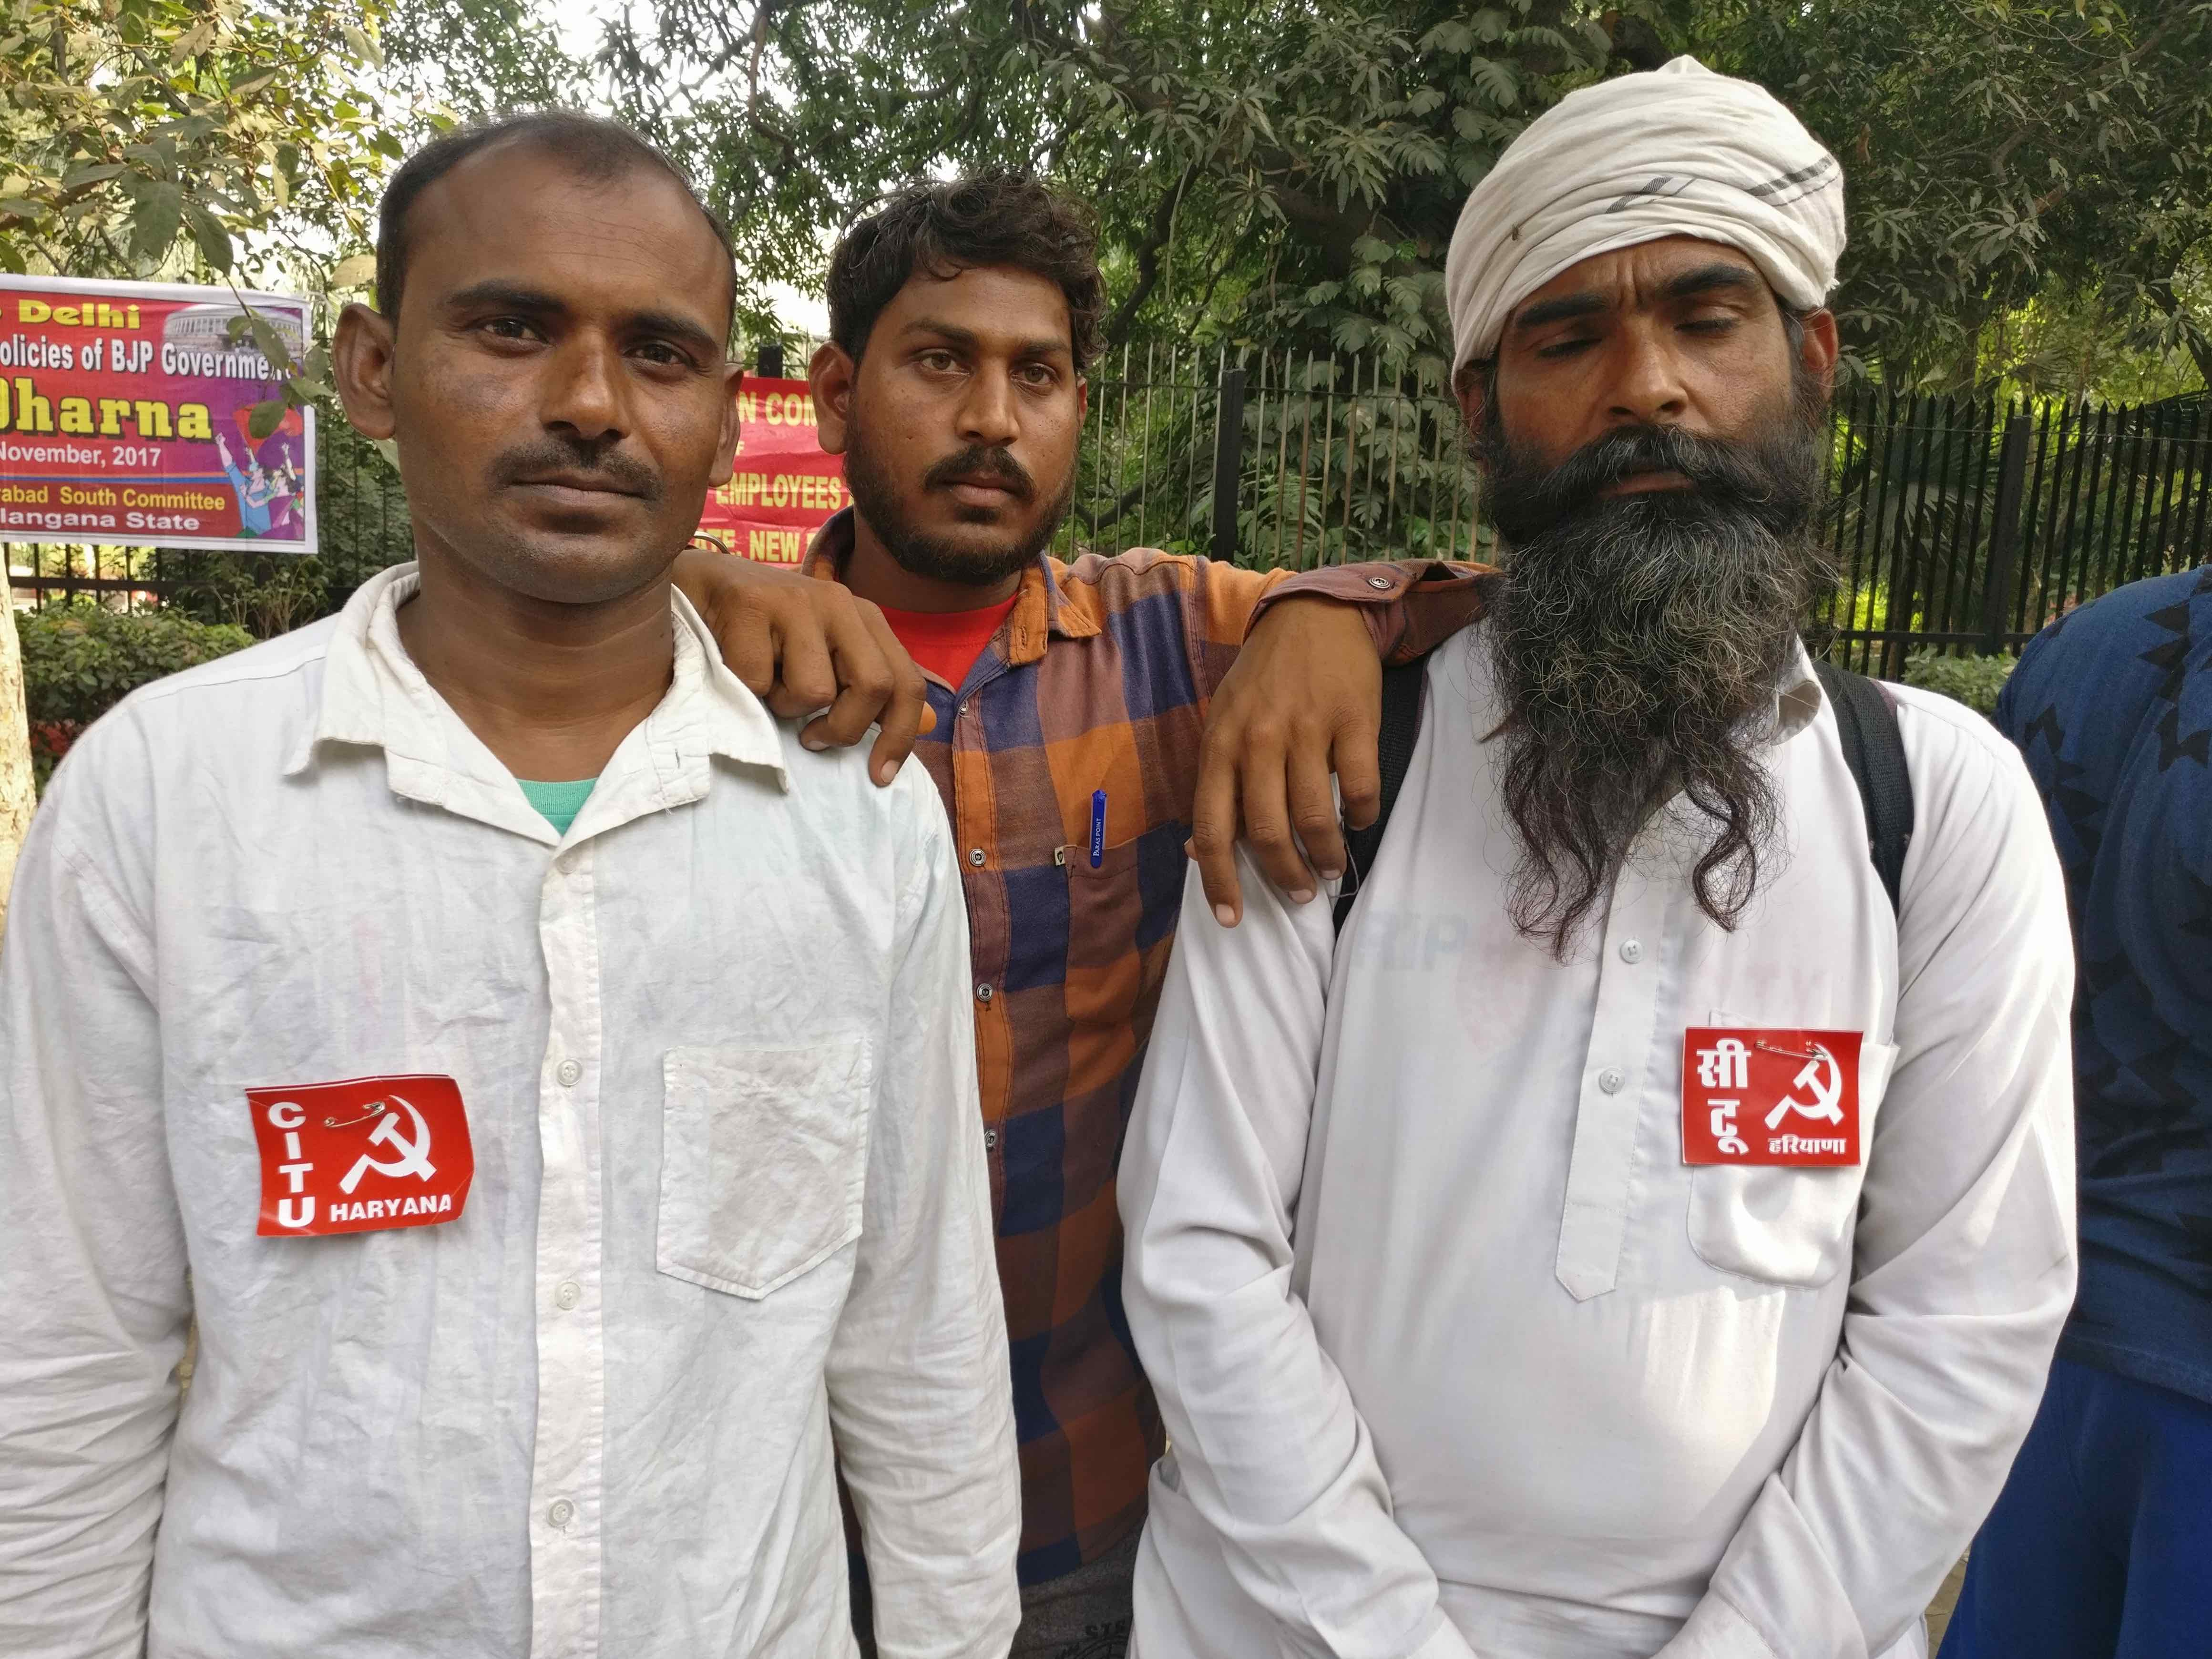 Sarvan Kumar (right). Credit: Ajoy Ashirwad Mahaprashasta/The Wire